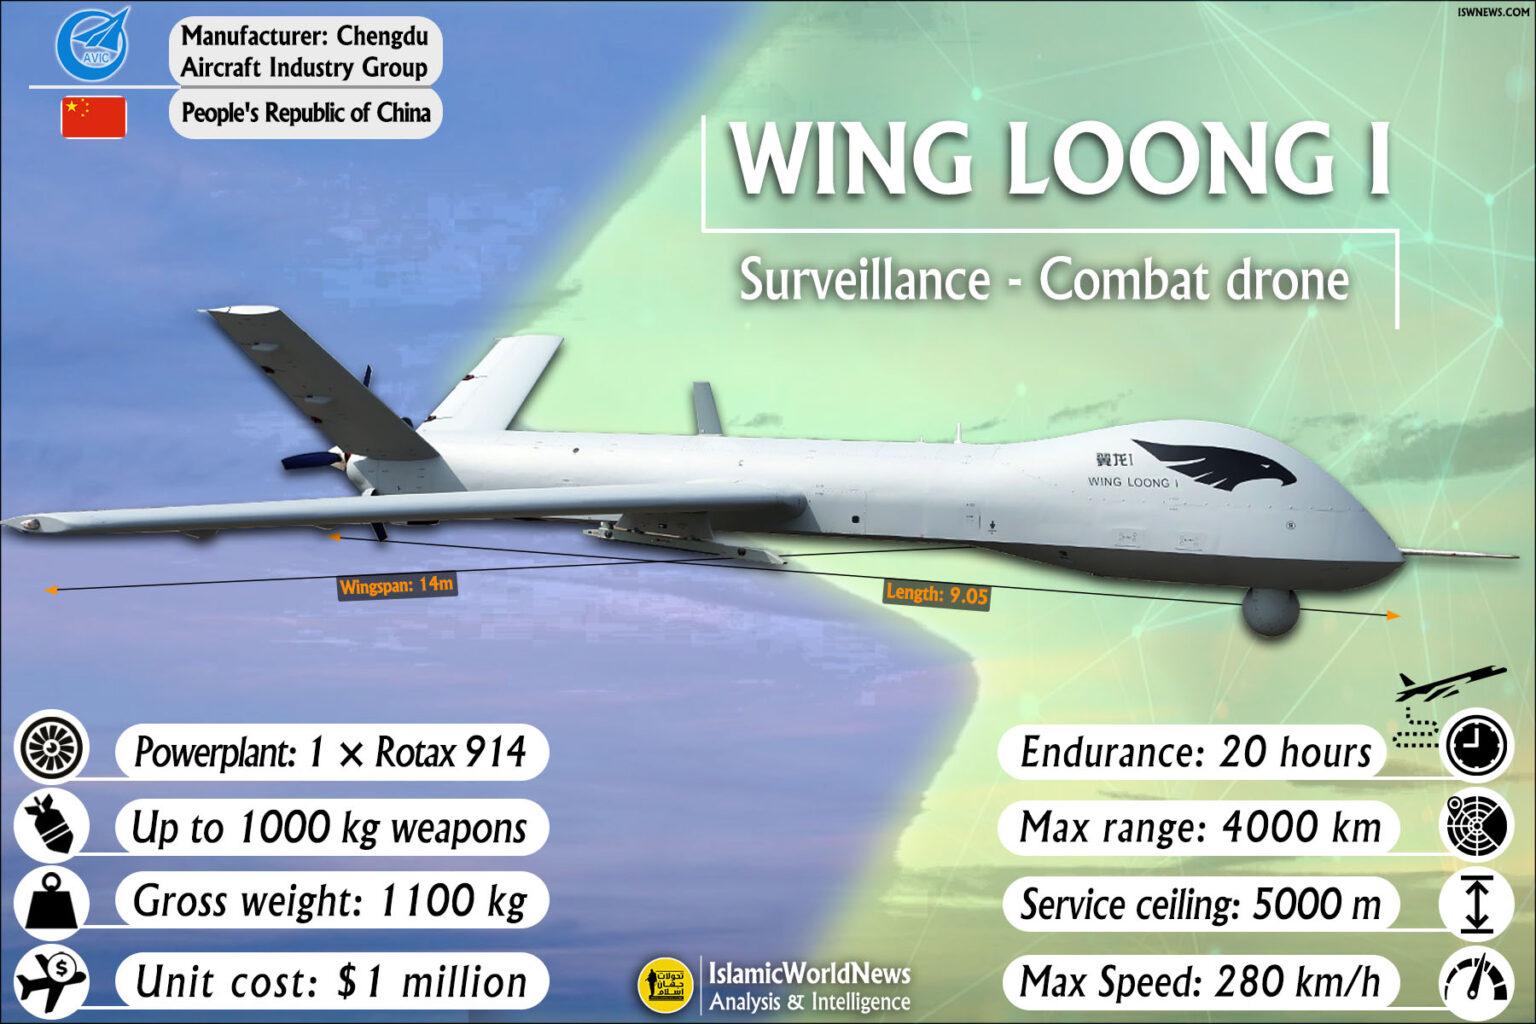 Wing-Loong-1-drone-پهپاد-وینگ-لونگ-1-en-1536x1024.jpg (1536×1024)